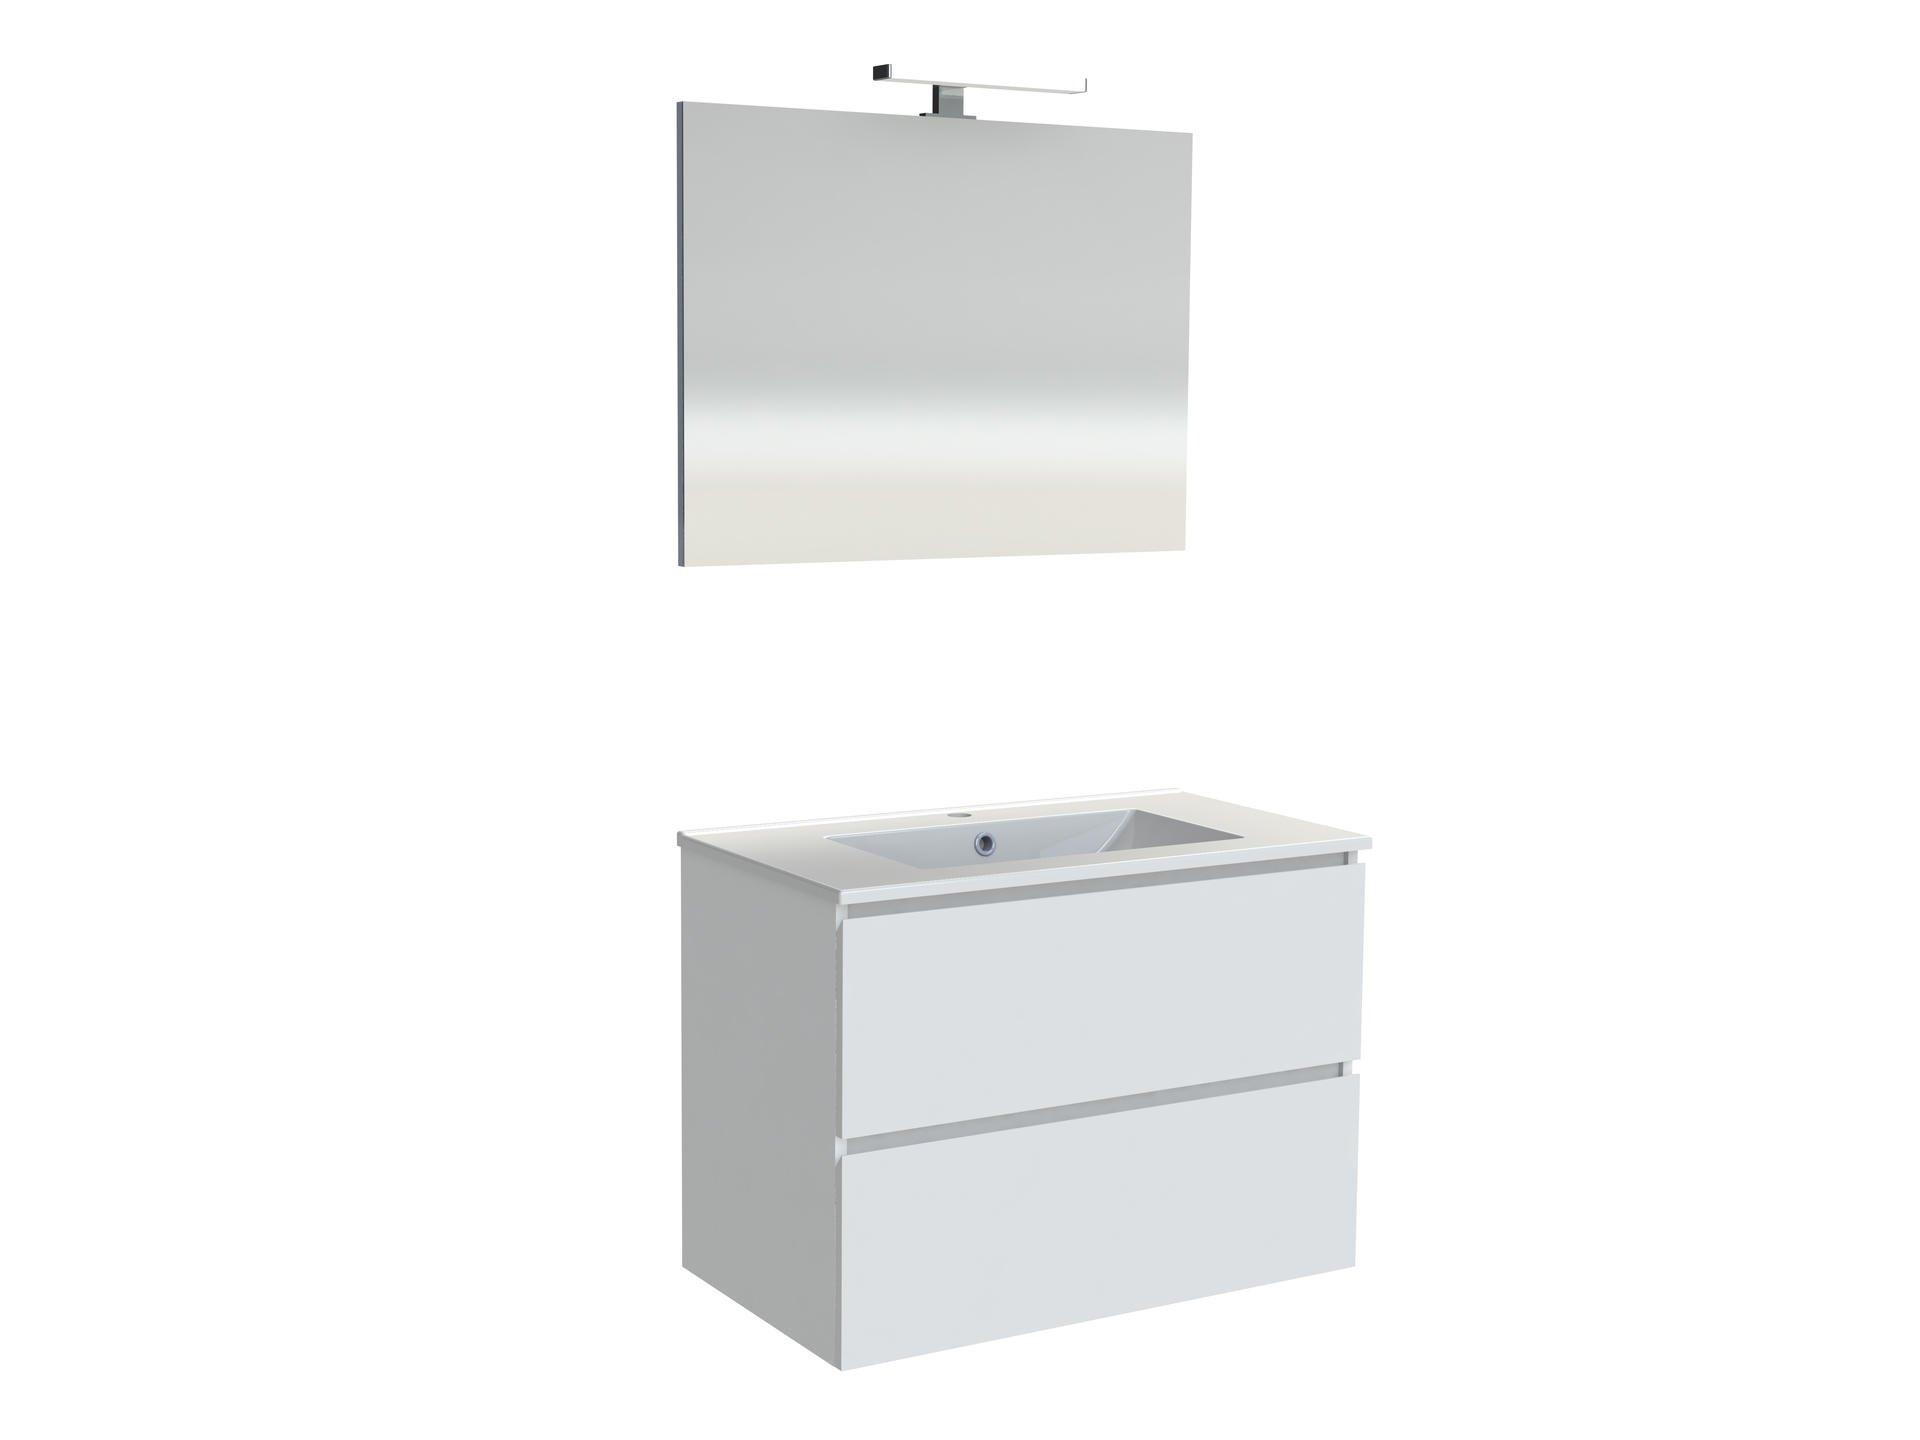 Feuille Stratifié Blanc Brillant meuble sous-plan livio 80 cm blanc brillant allibert - mr.bricolage